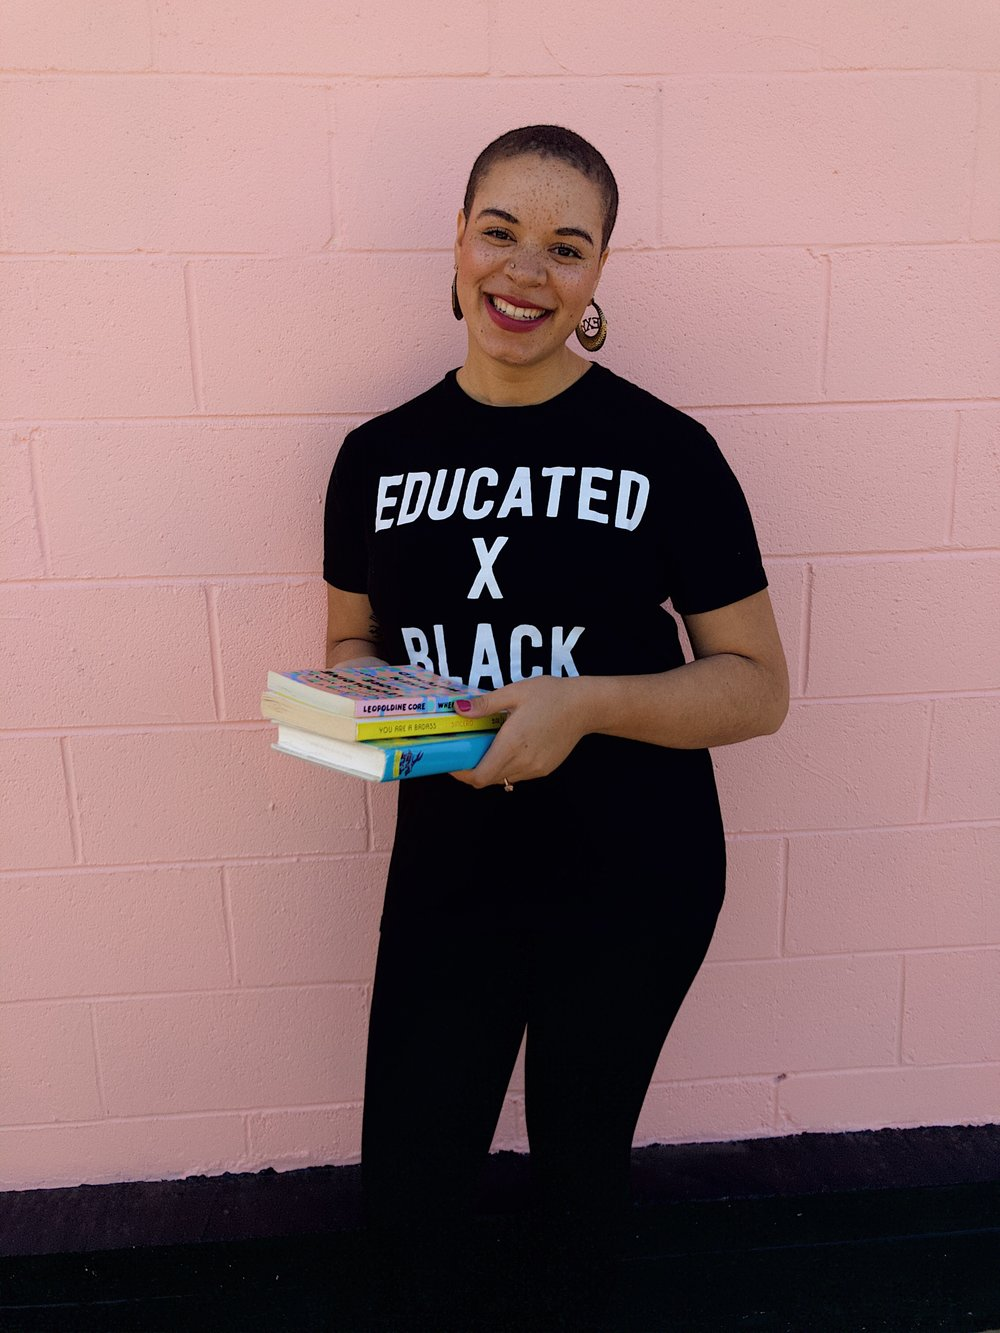 Educated x Black Exploring Self.jpg